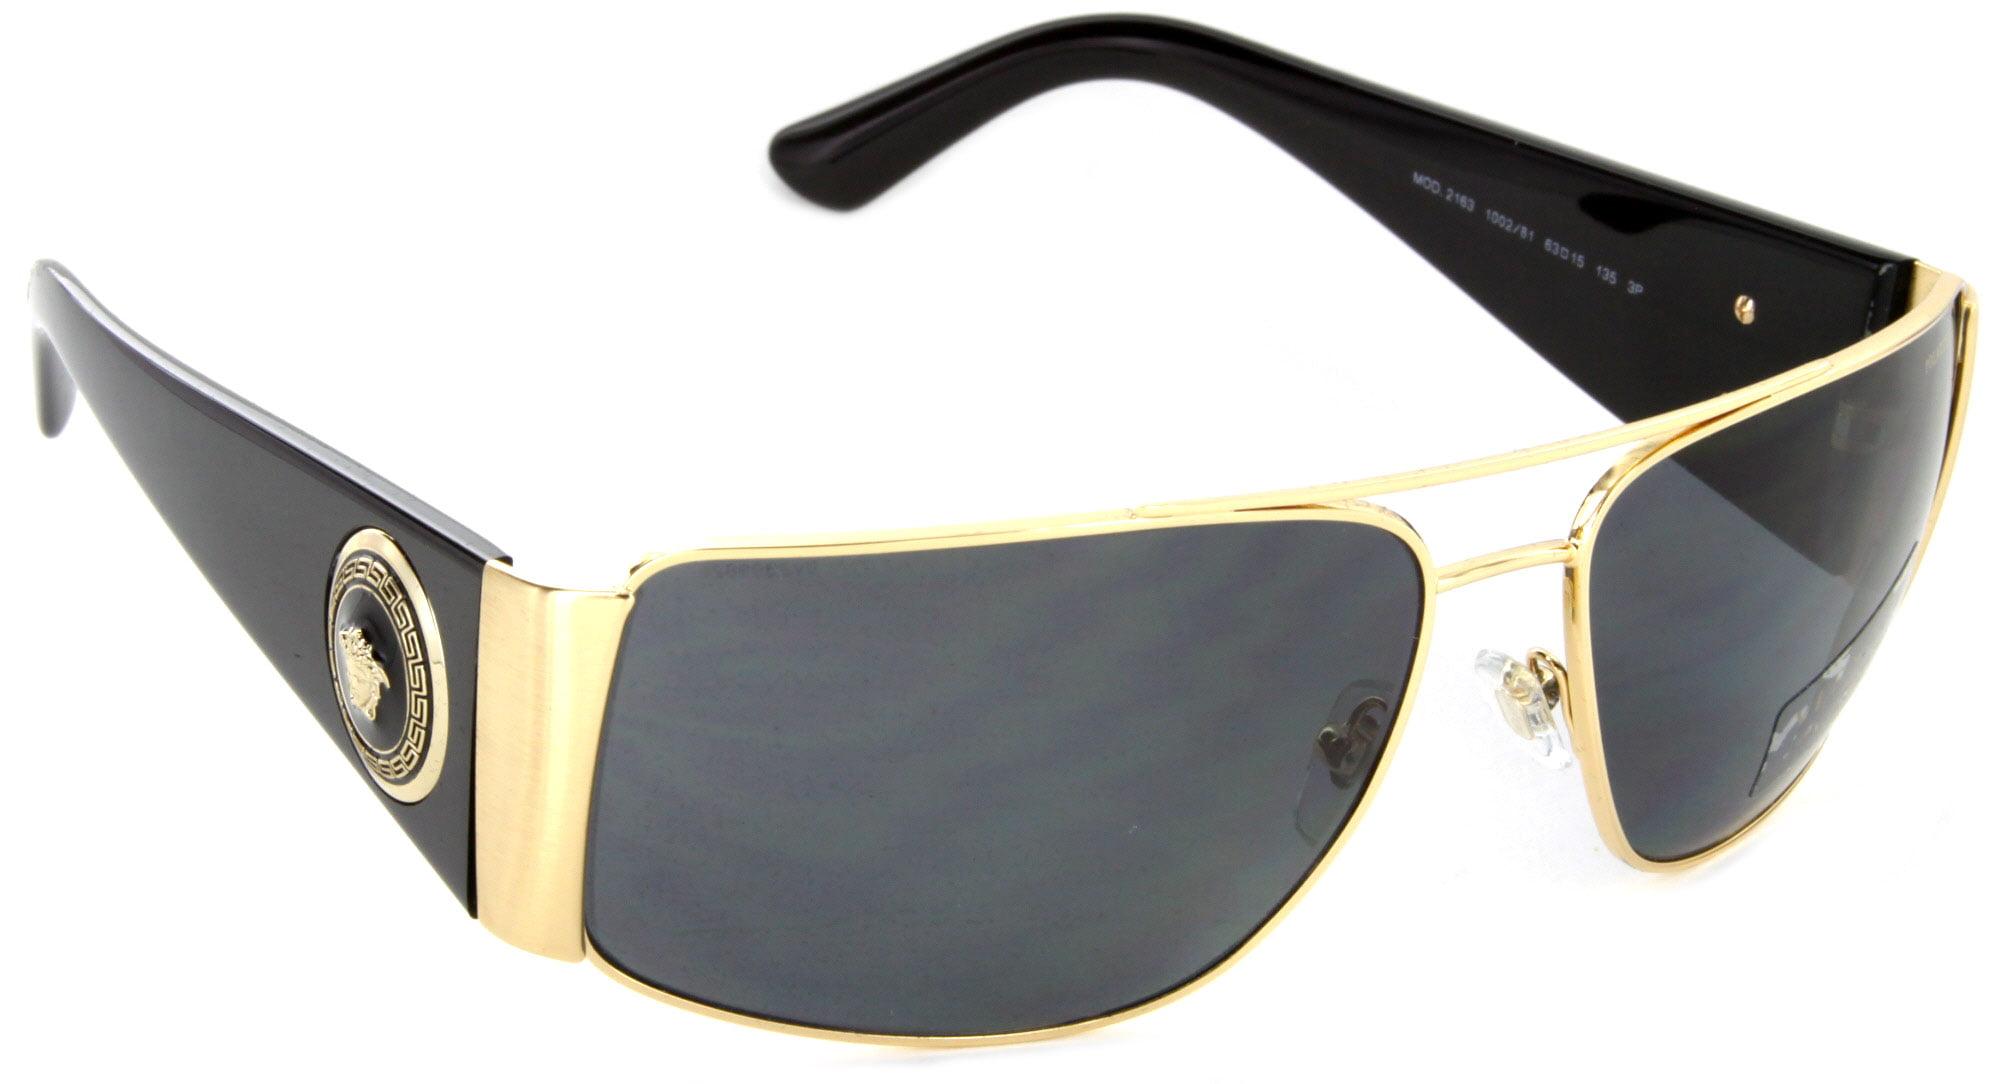 de863d846cf Versace - Versace Mens Sunglasses (VE2163) Gold Grey Metal - Polarized -  63mm - Walmart.com